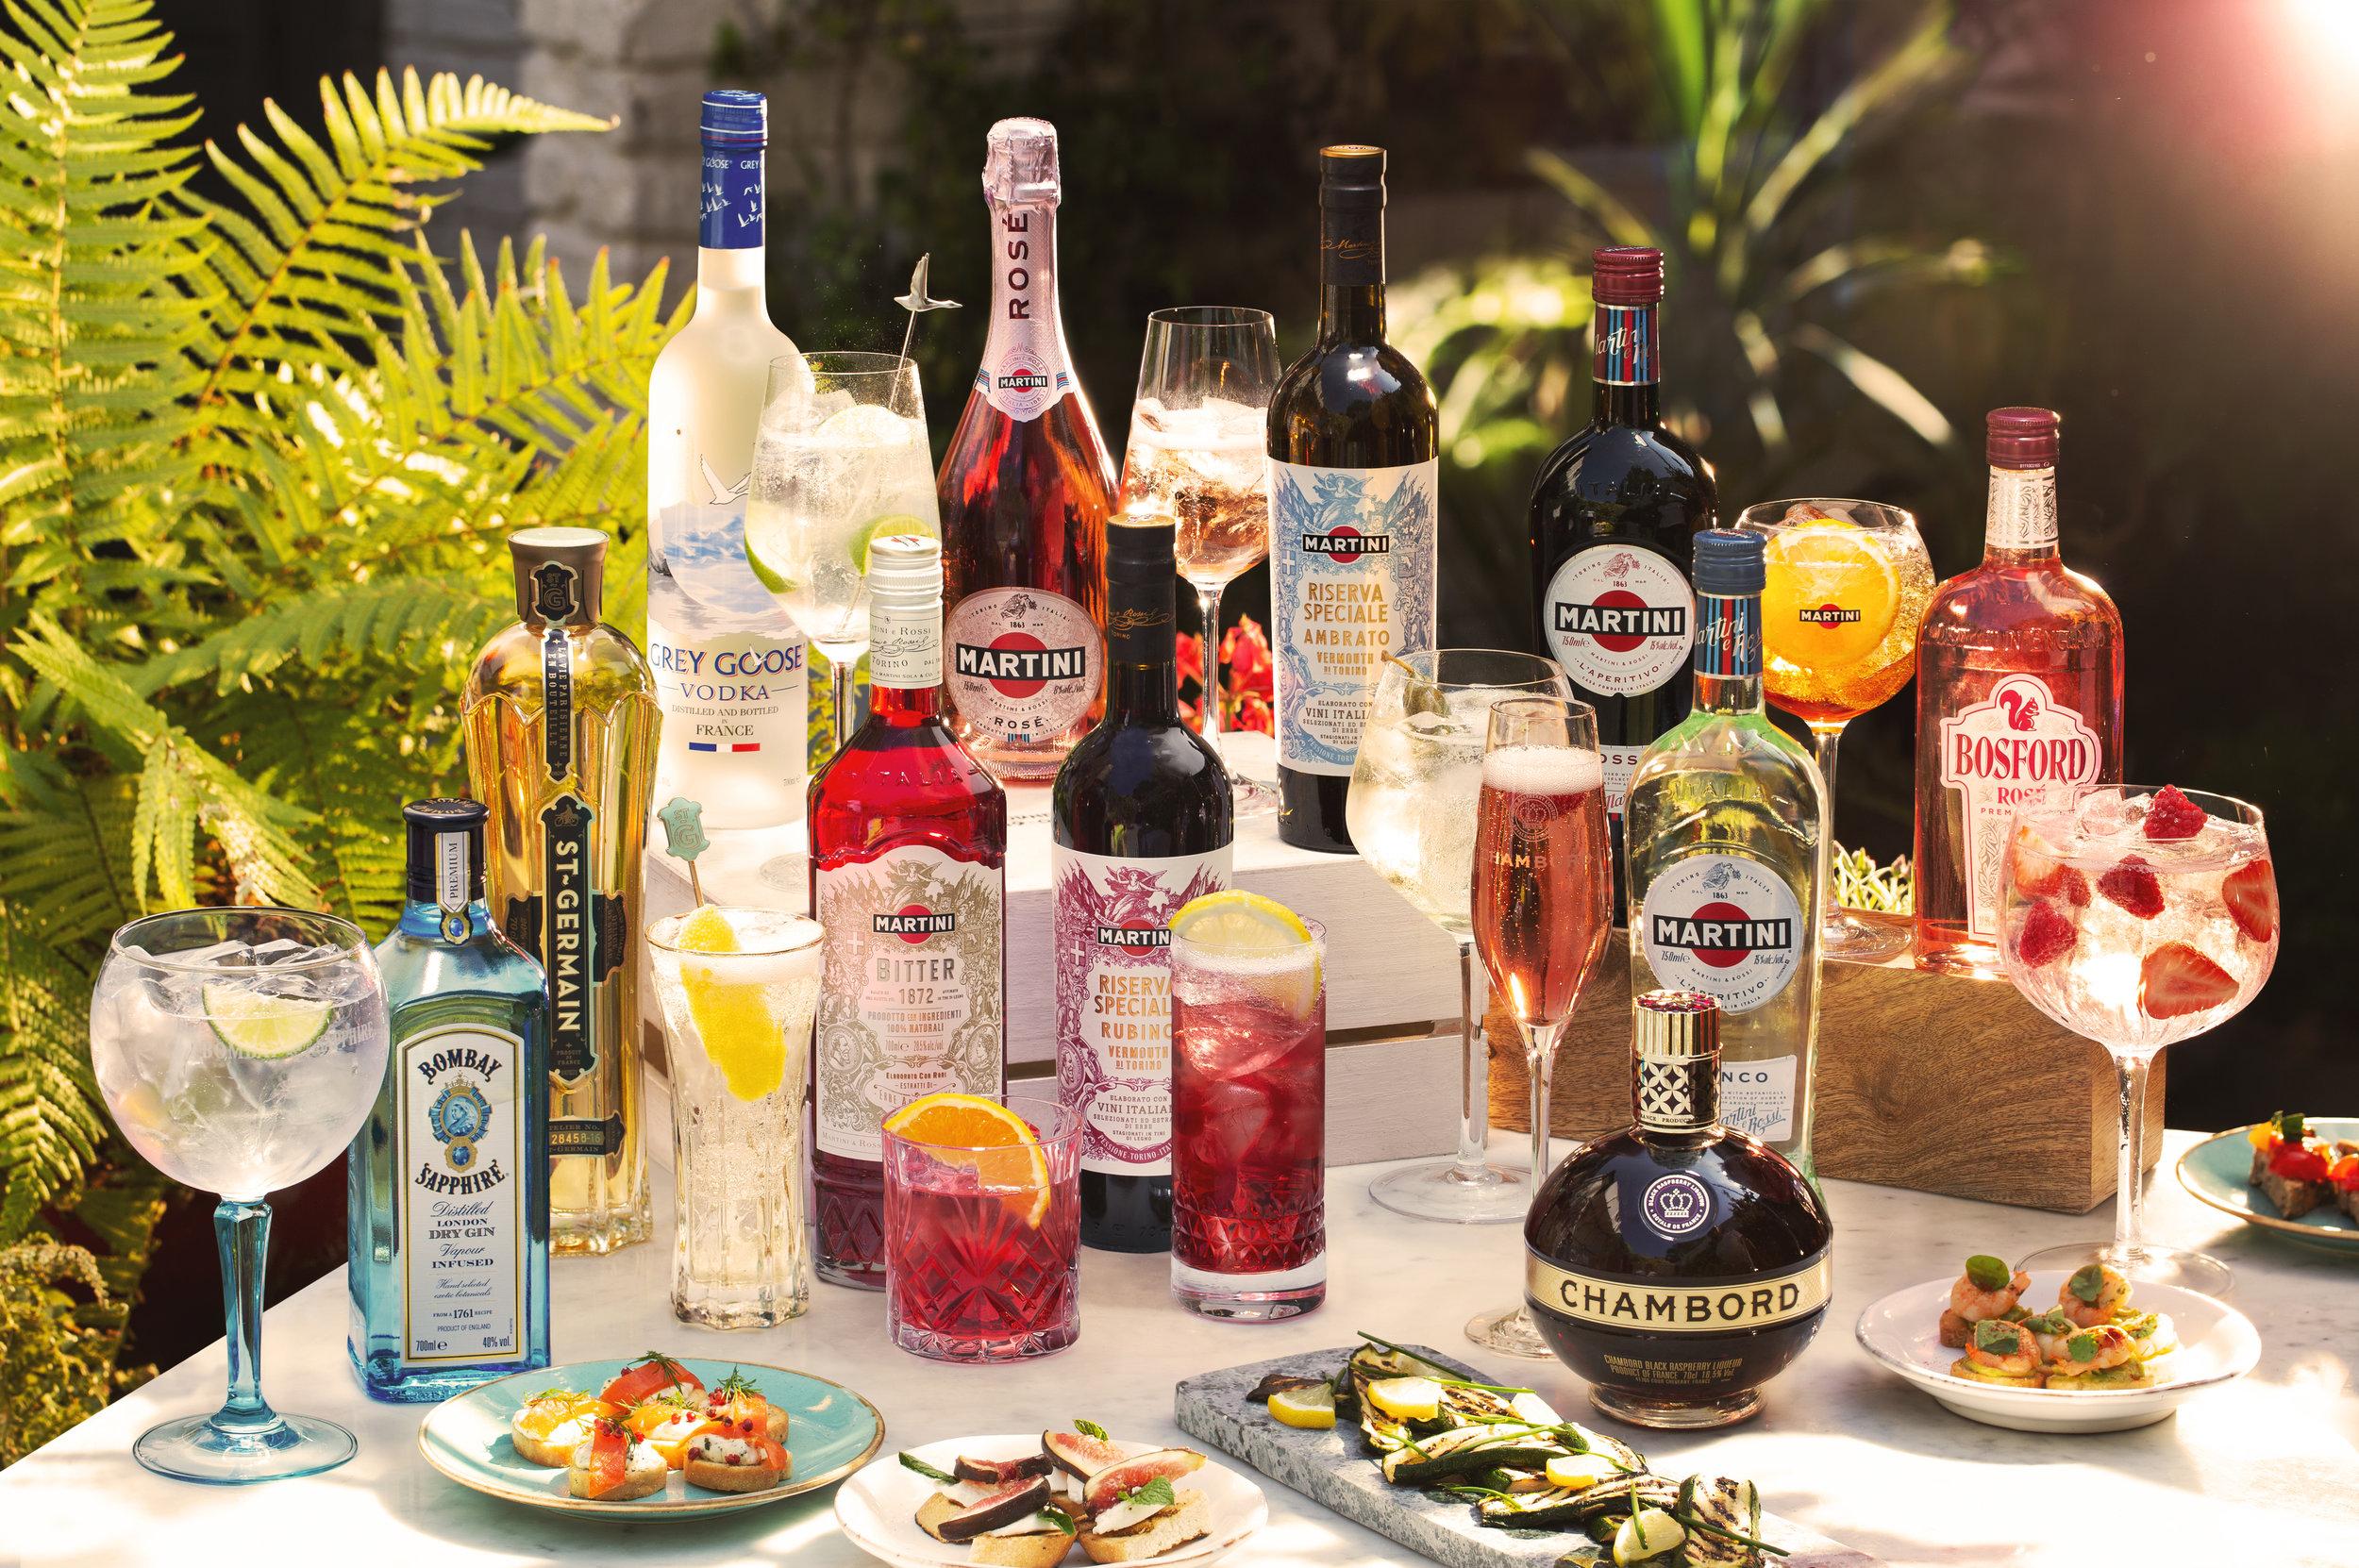 Bacardi_AperitivoMoment_Drinks+Bottles+Food_Best_lg.jpg